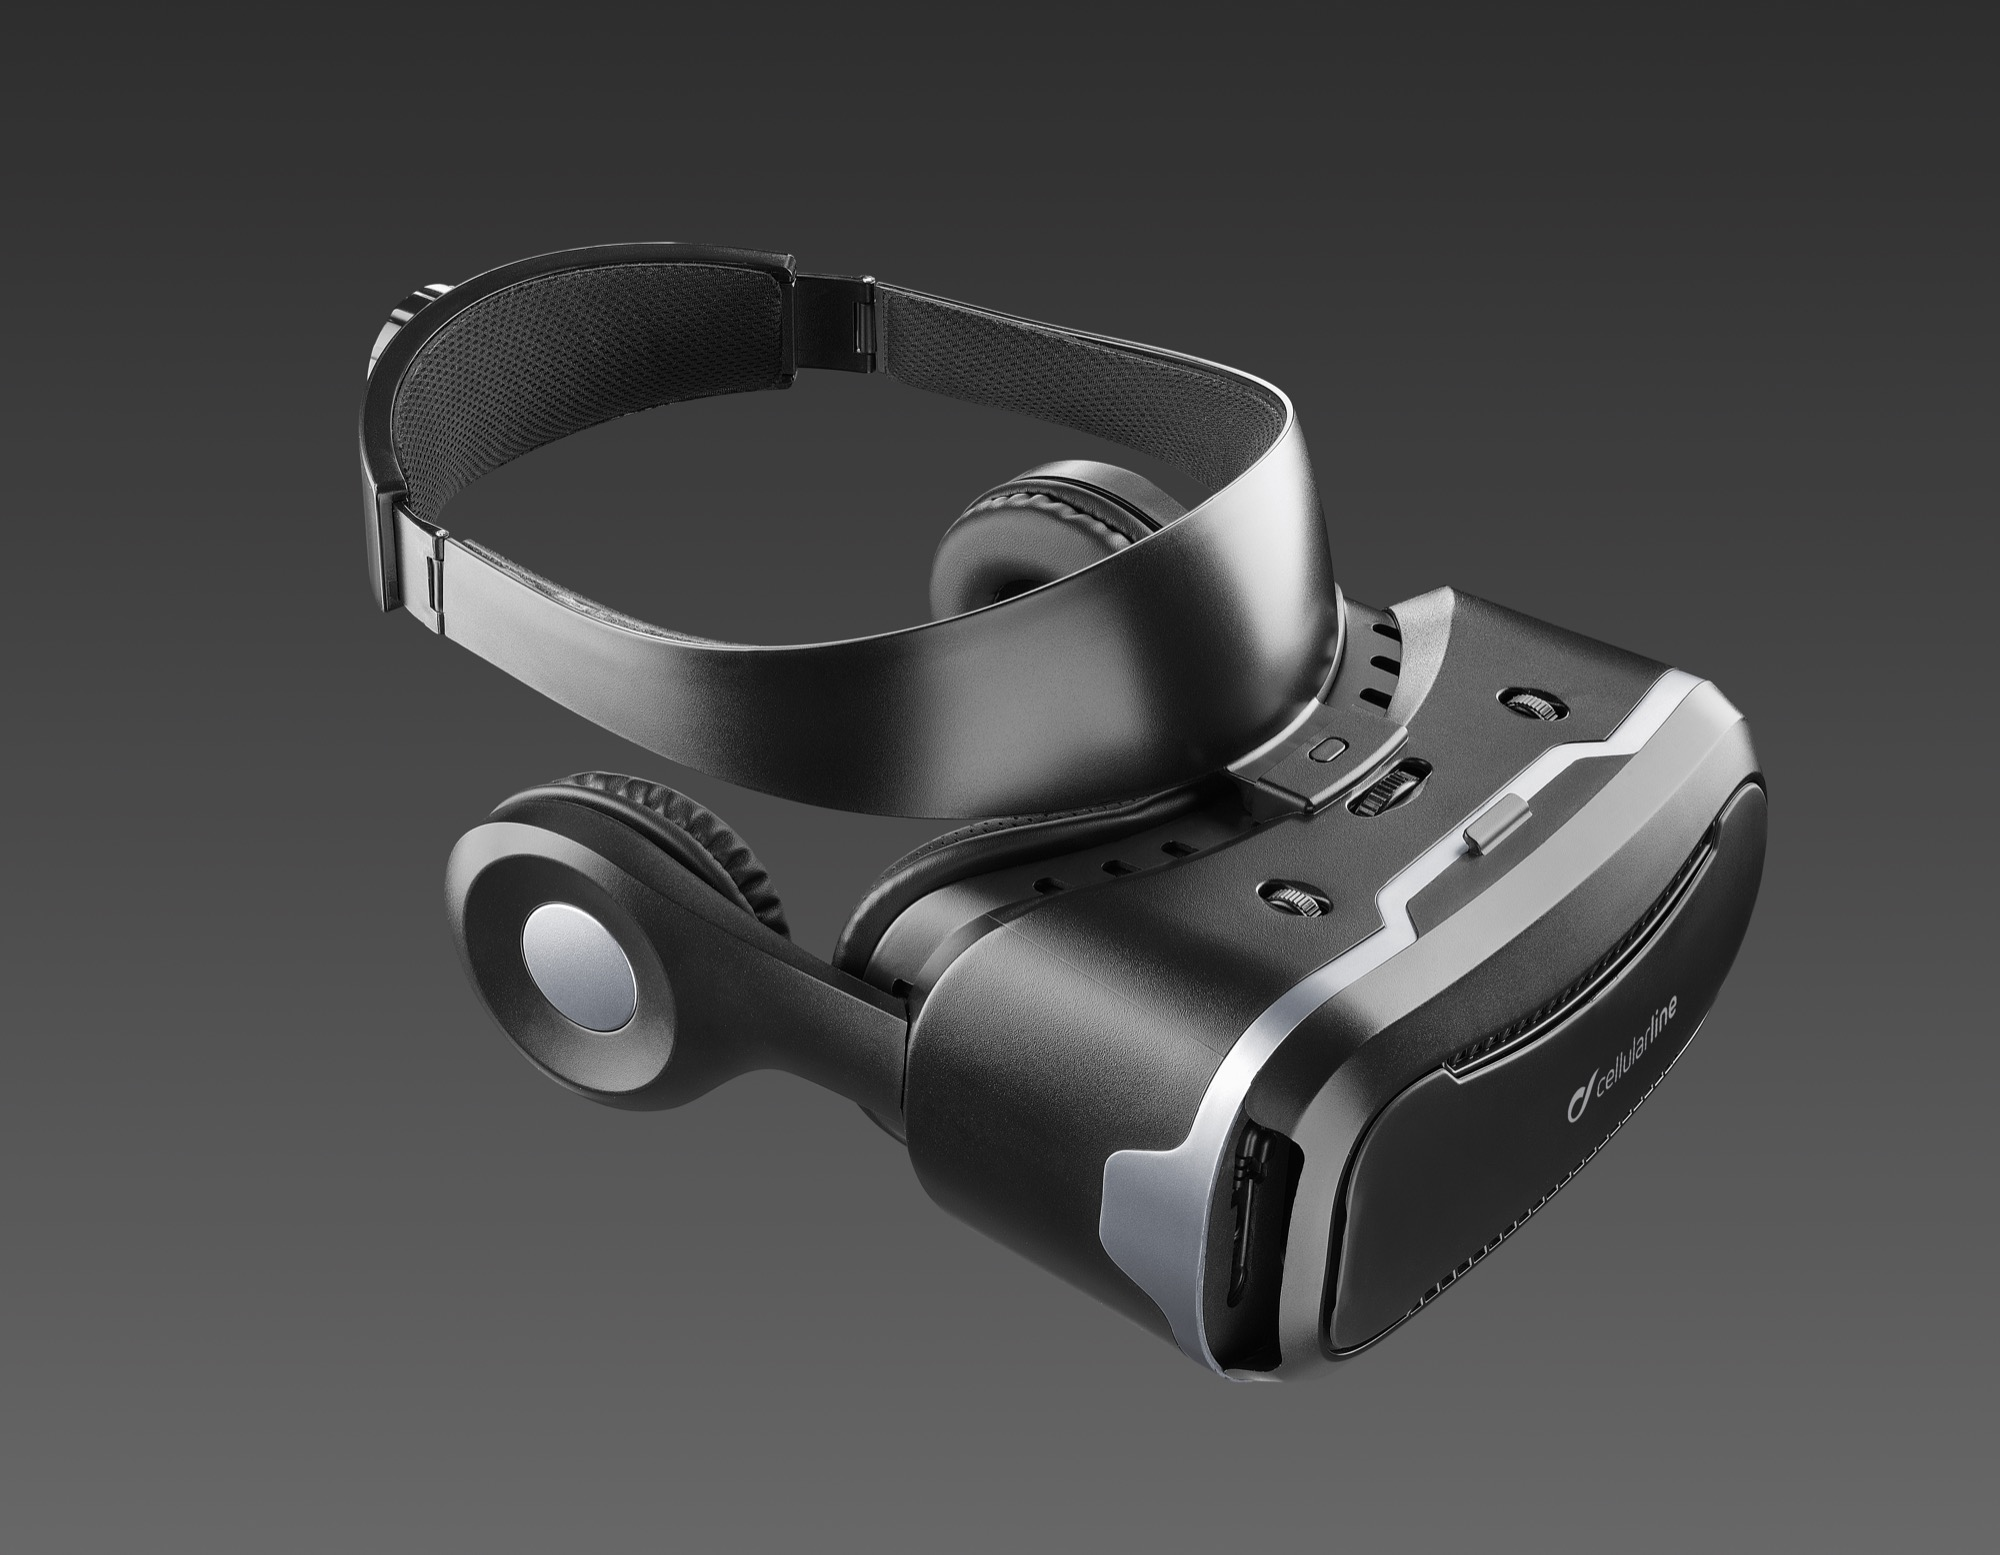 Cellularline Zion VR Immersion